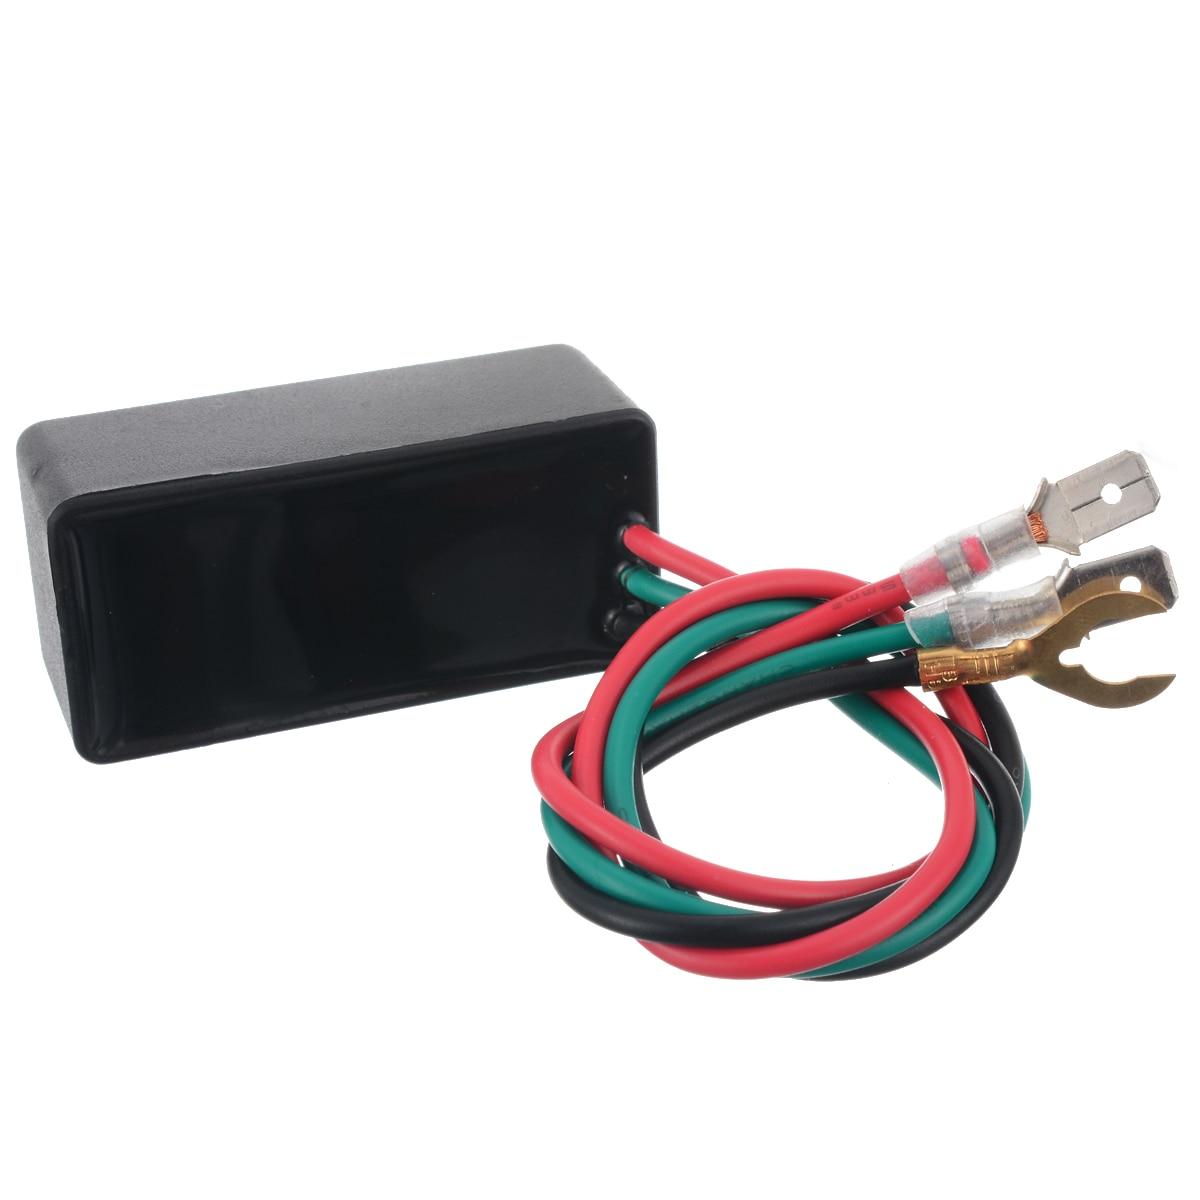 1PC 3Pin 12V Motorcycle LED Blinker Flasher Relay Turn Signal Light DOP-3X Flash Relay For Car/Motorbike Halogen/LED Lamp